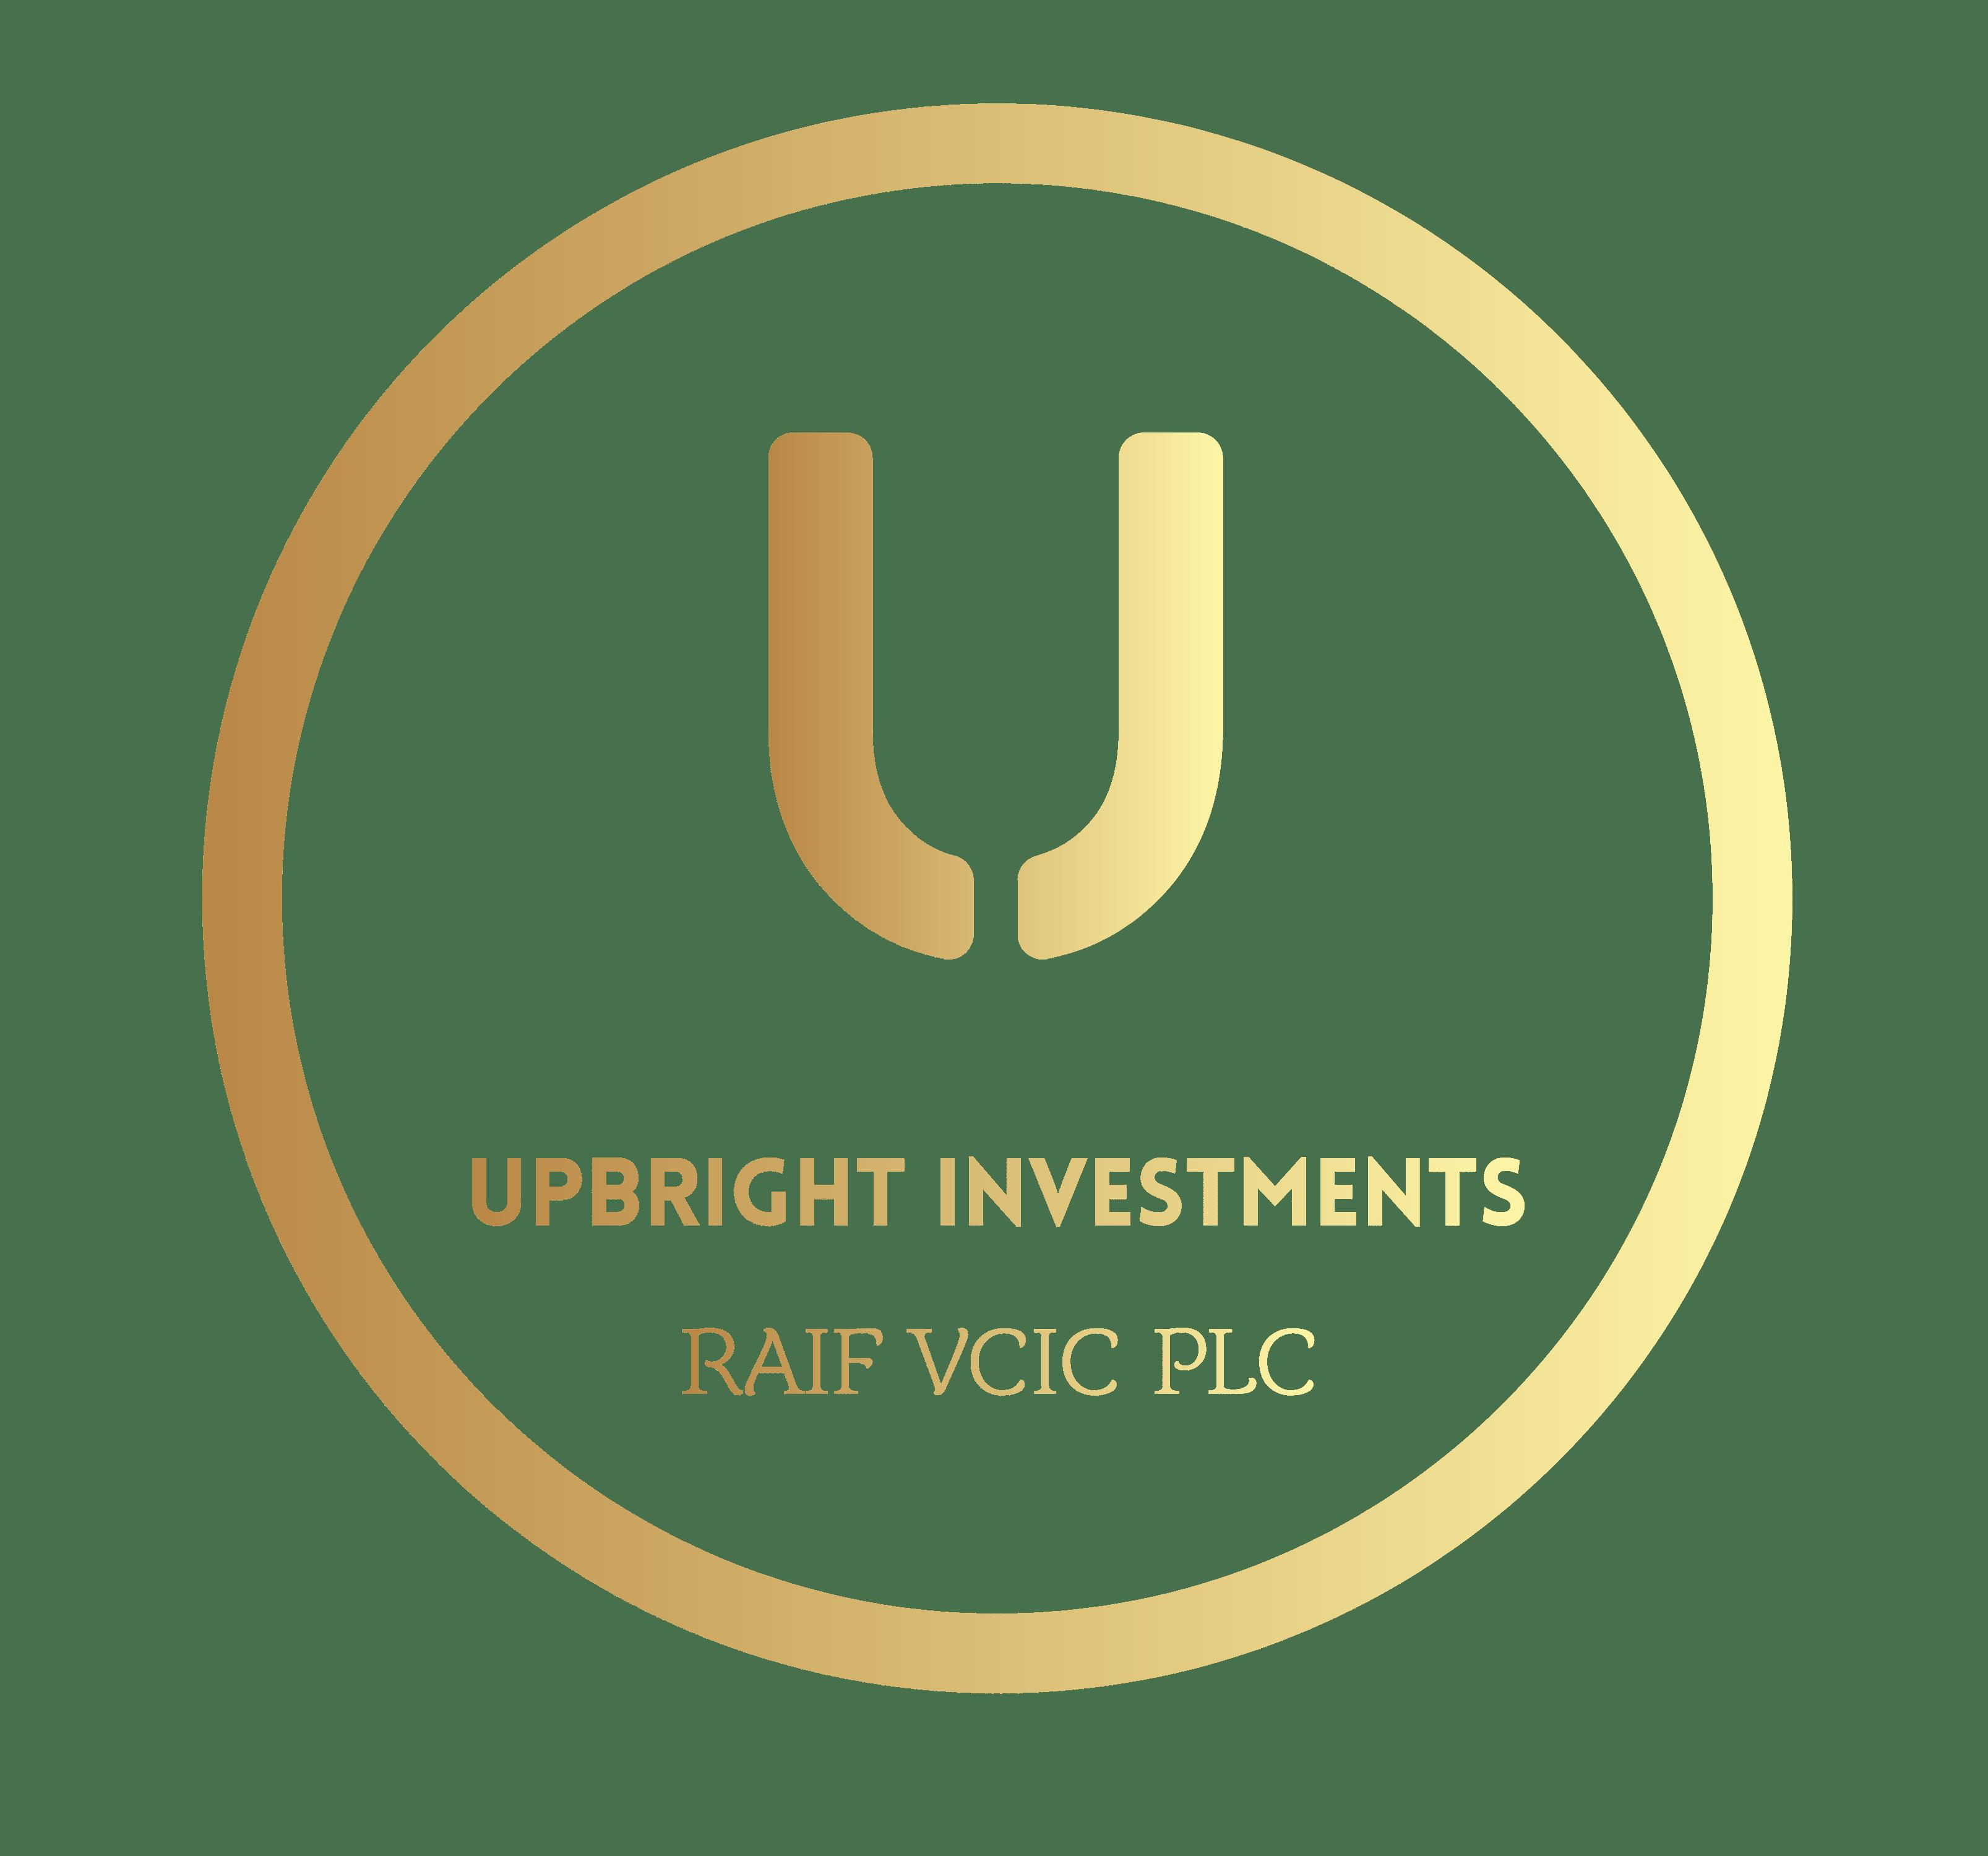 UPBRIGHT INVESTMENTS RAIF VCIC PLC